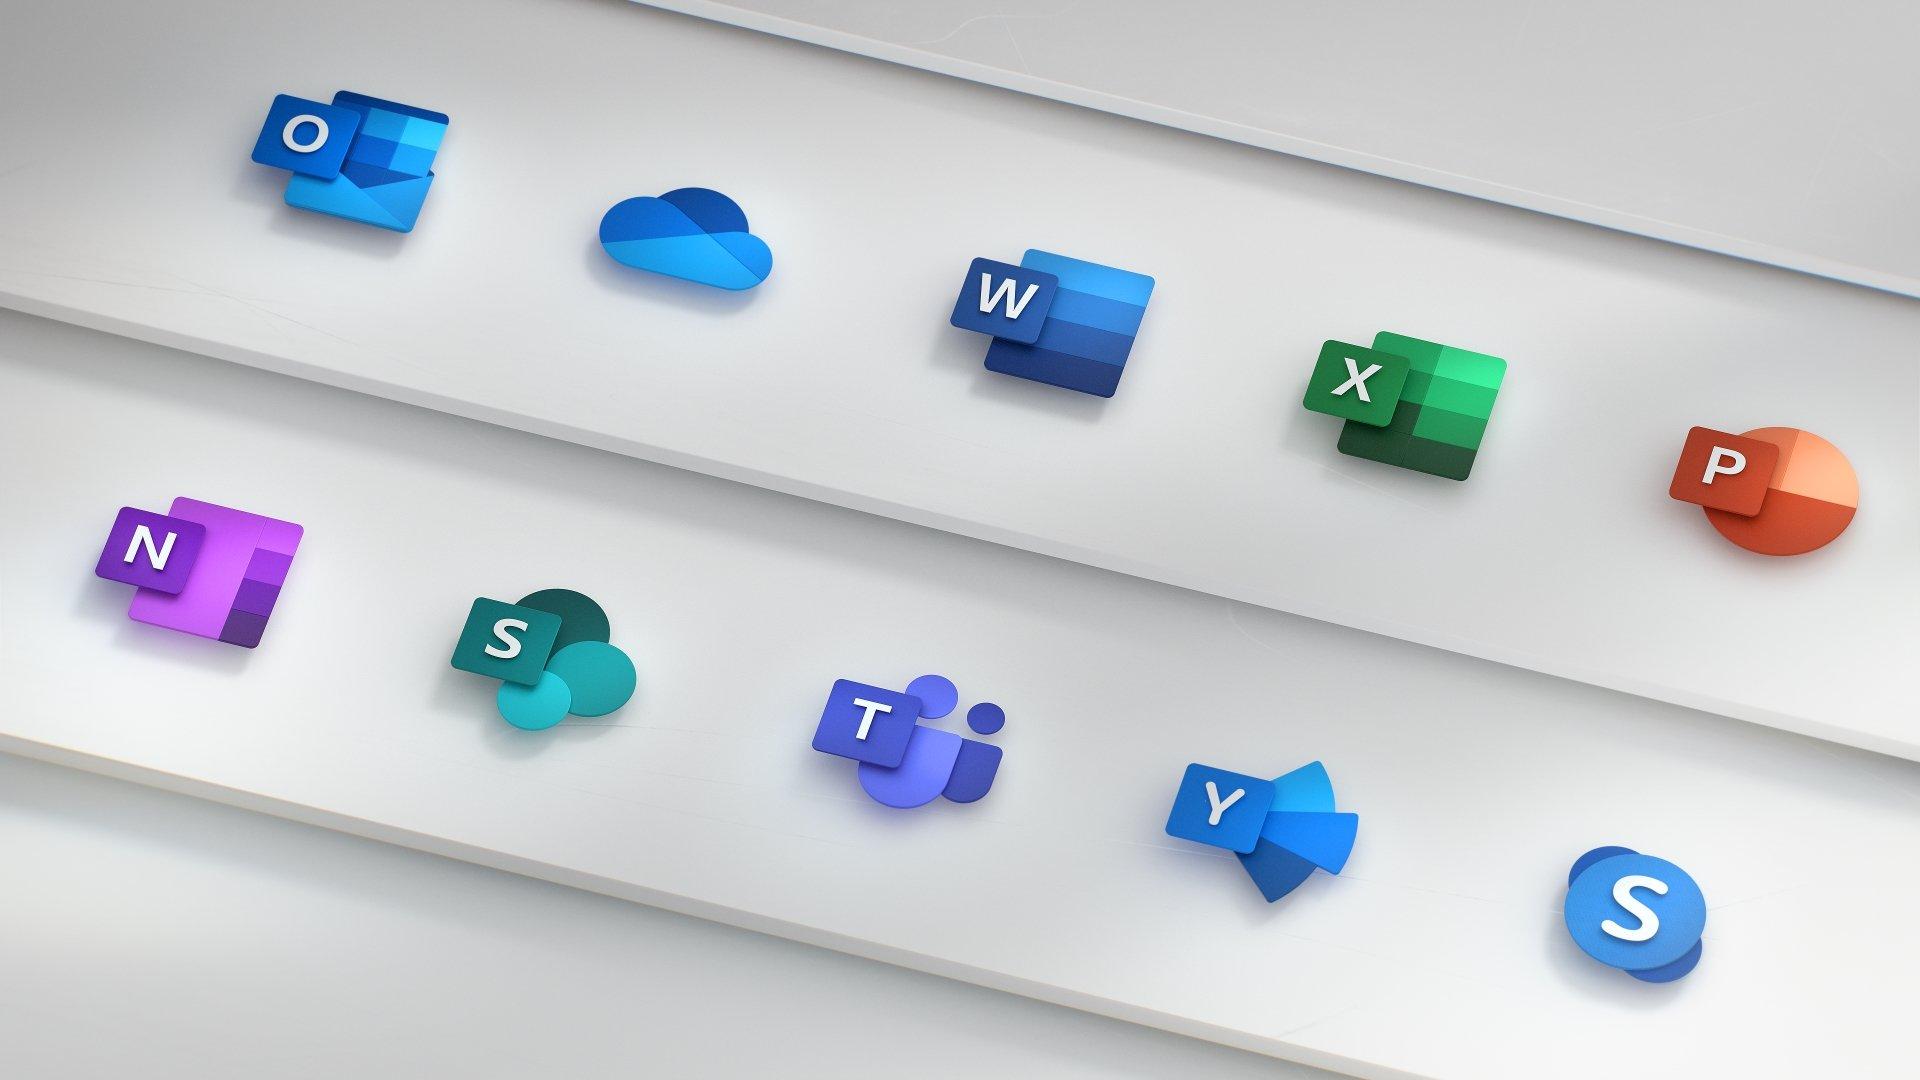 ícones do office